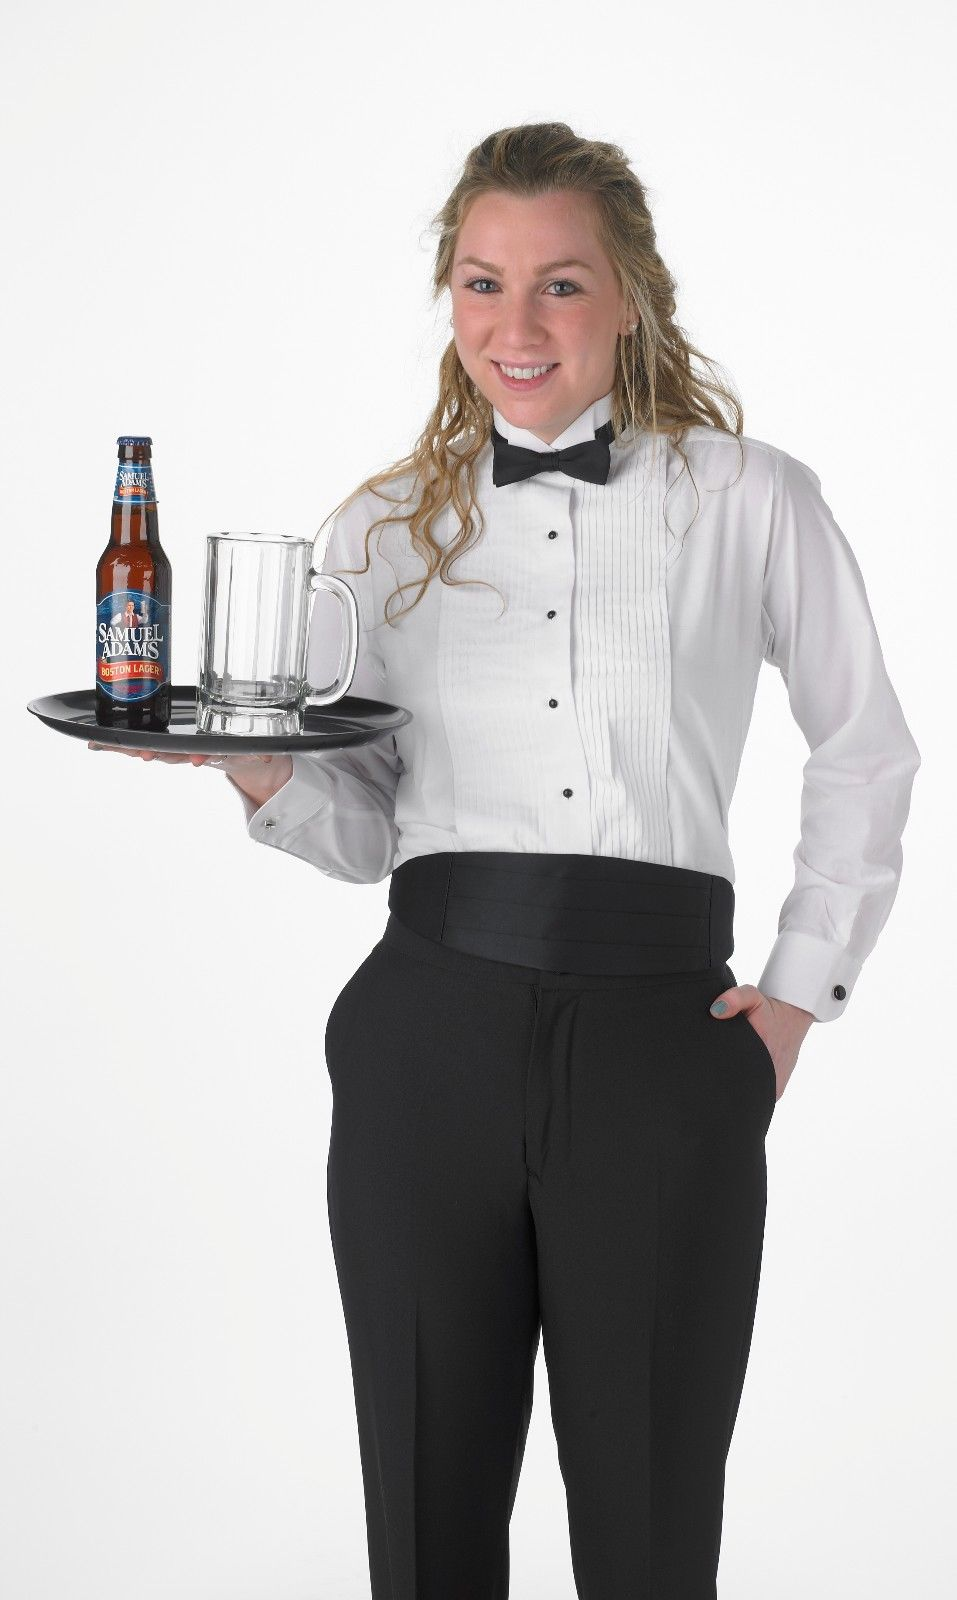 BONUS Black Bow Tie NEW Premium Men's Tuxedo Long Sleeve Shirt Wing-Tip Collar